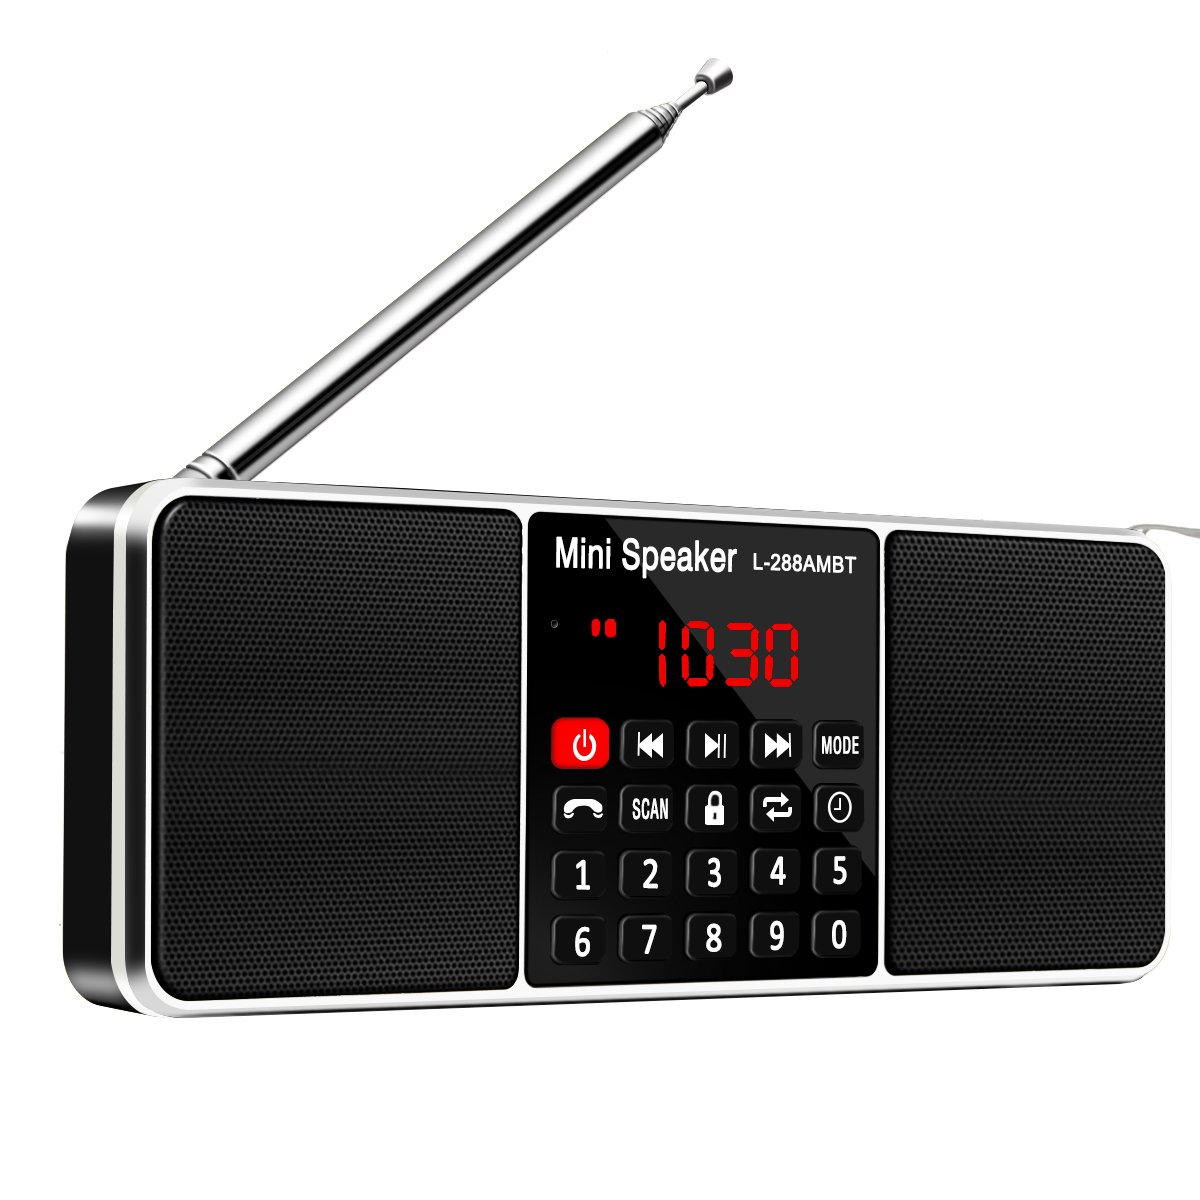 Bluetooth Radio Speaker,ELEGIANT Portable Multifunction Dual Channel Digital AM/FM Radio Media Wireless Speaker MP3 Music Player Support TF Card/USB Disk with LED Screen Display, Clock Function